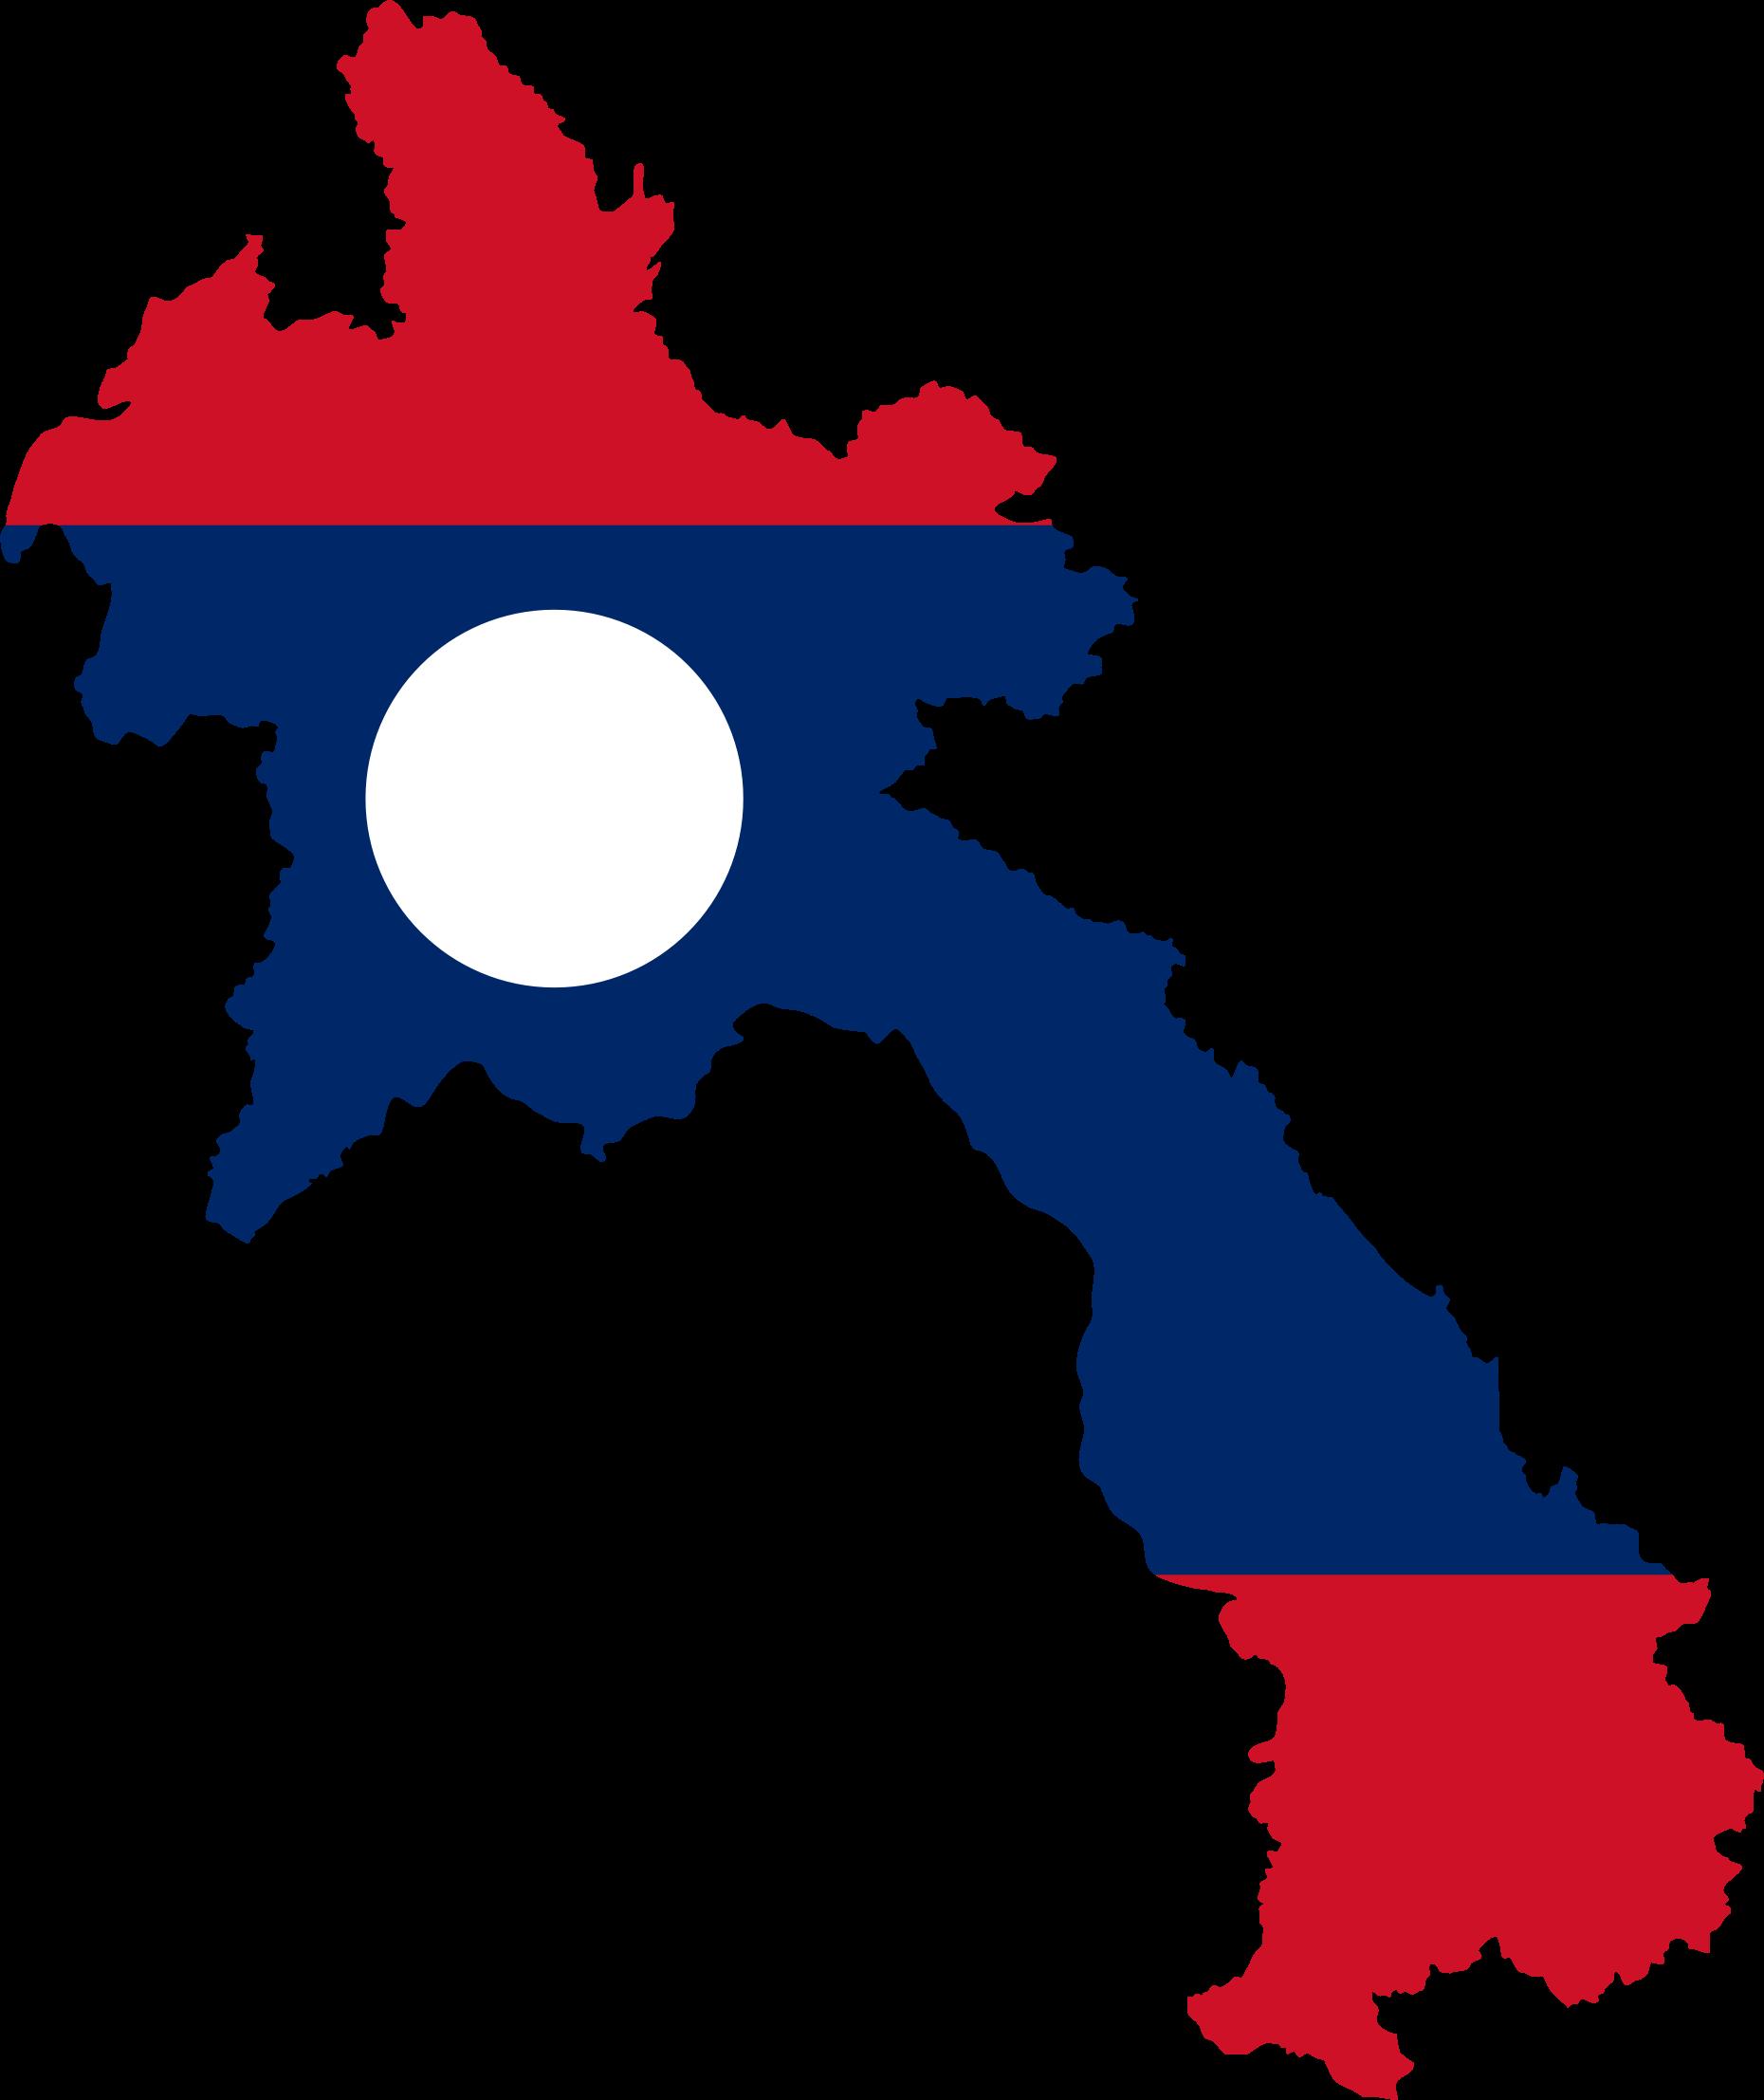 Laos clipart #12, Download drawings